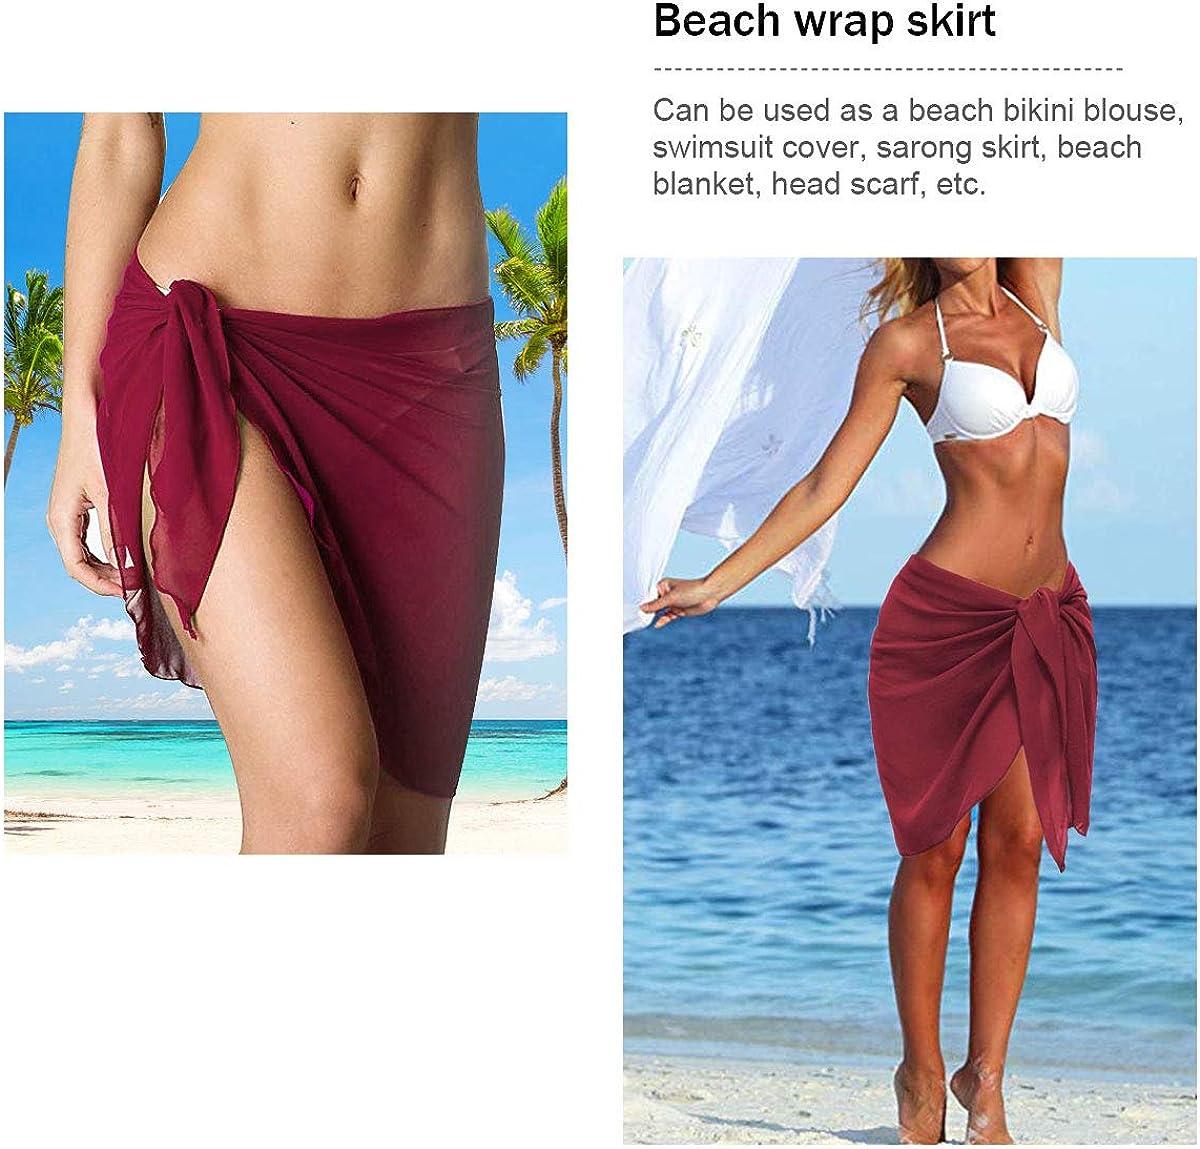 2PC Frauen Chiffon Sarong Strandtuch Bikini Cover up Wickelrock Wickeltuch Strandkleid Schal Halstuch ECOMBOS Damen Chiffon Sarong Pareo